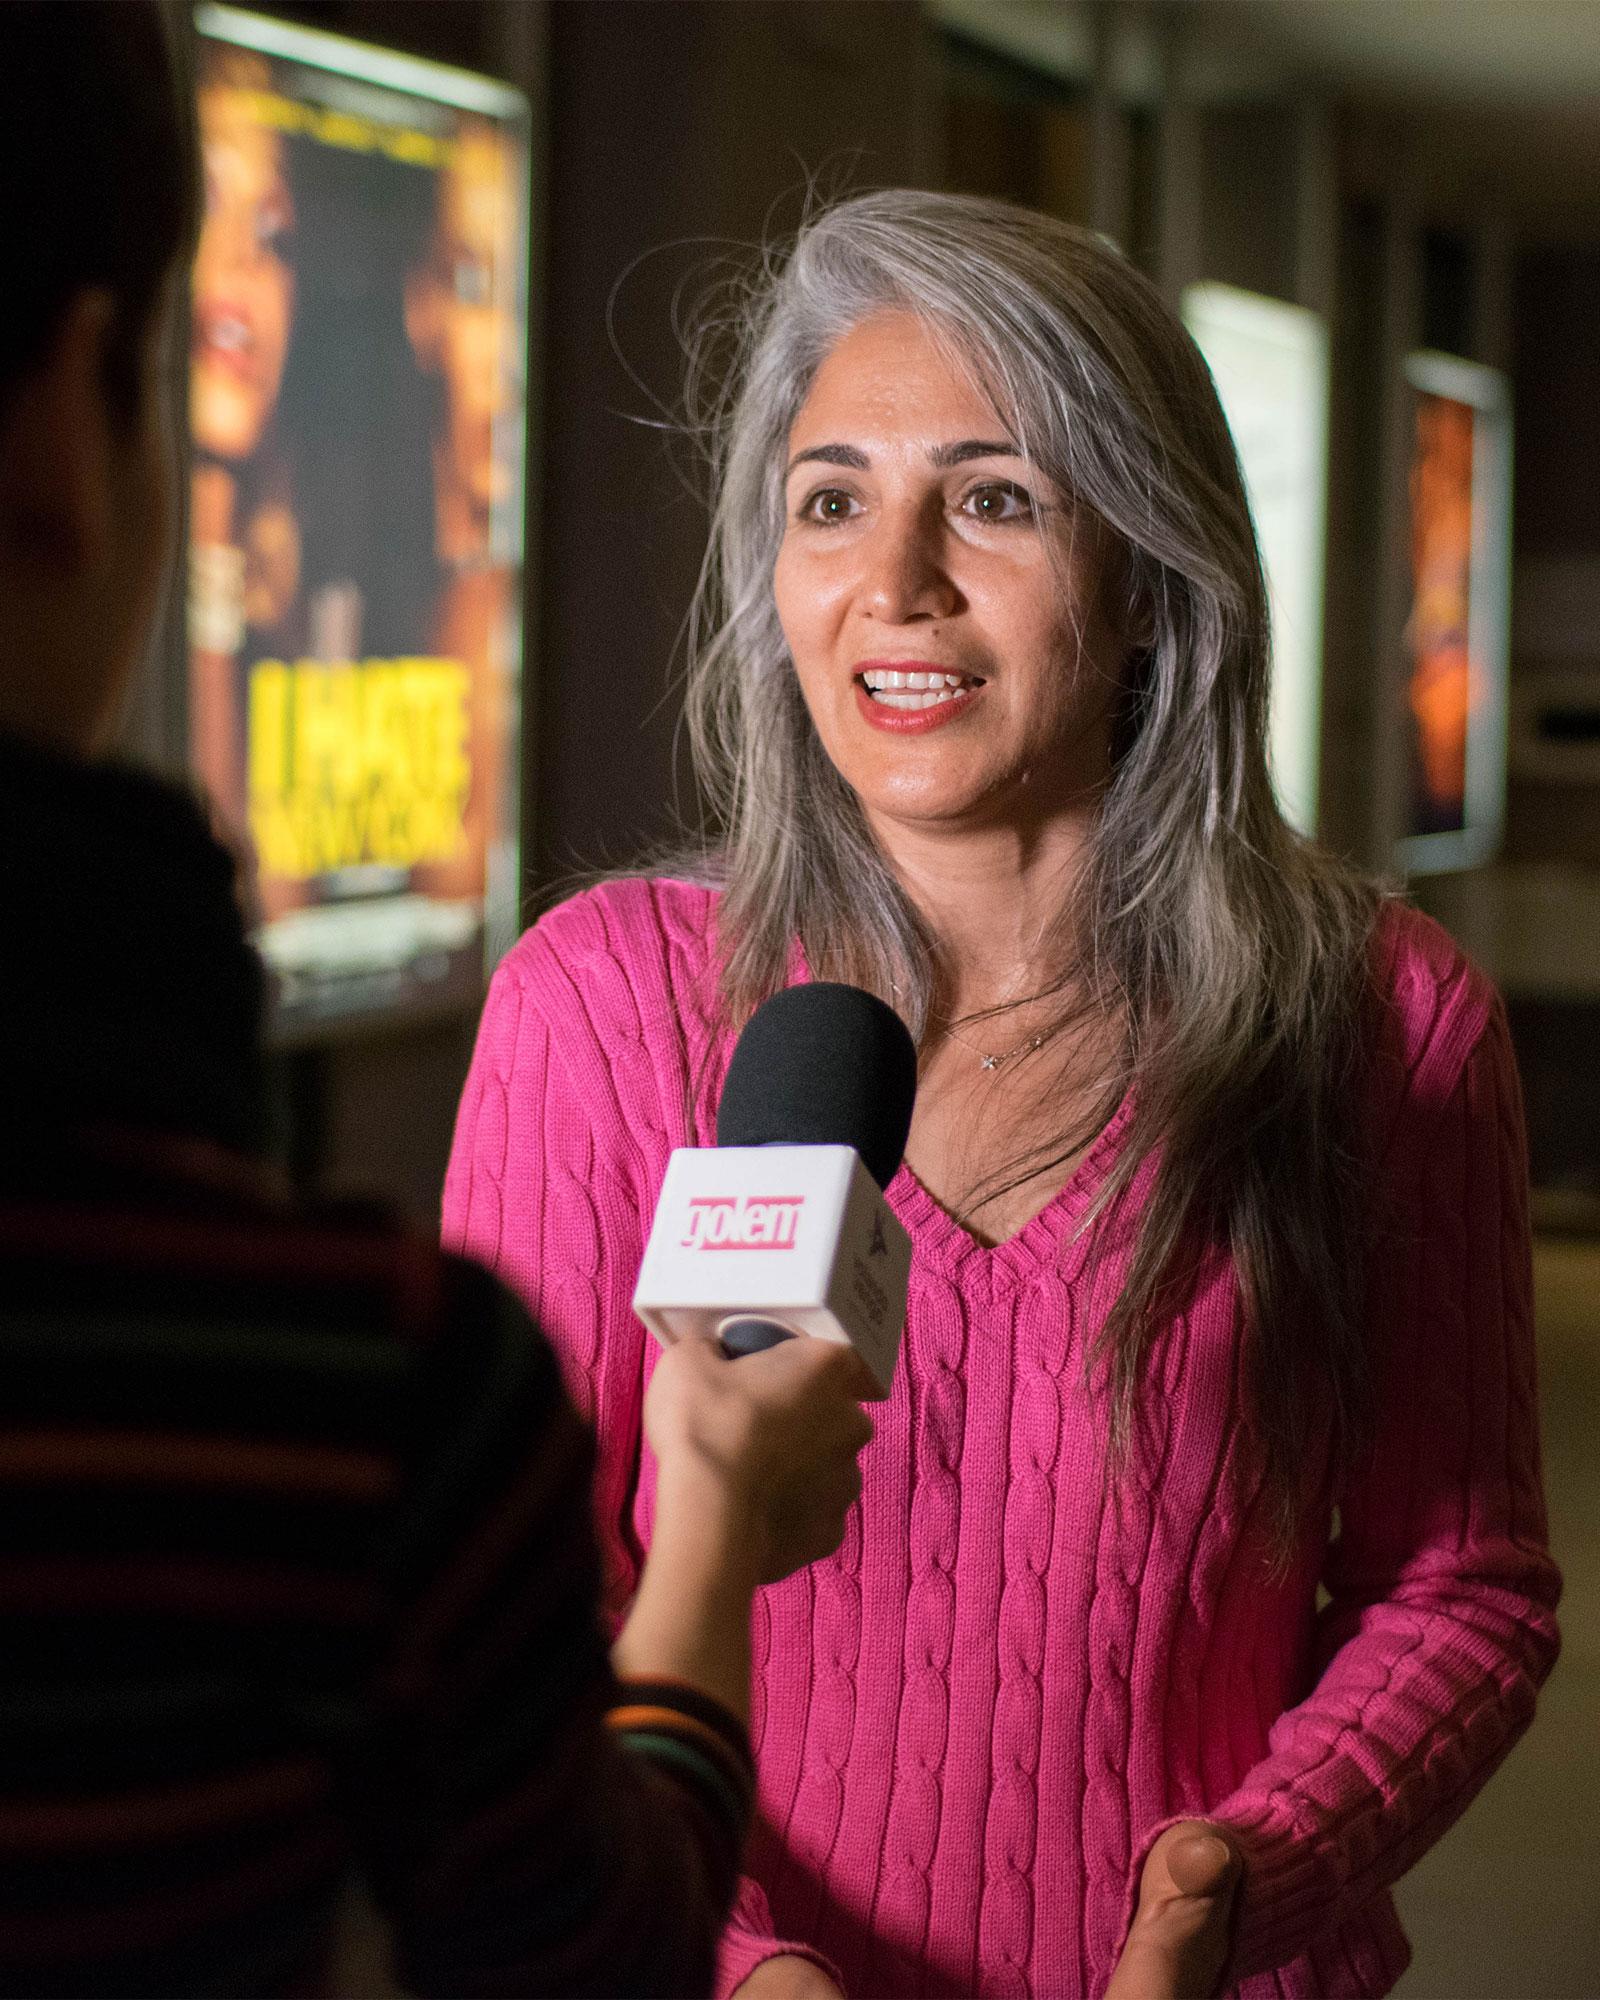 Entrevista, preestreno Tres Caras, Fariba Ehsan, cines Golem, Jafar Panahi